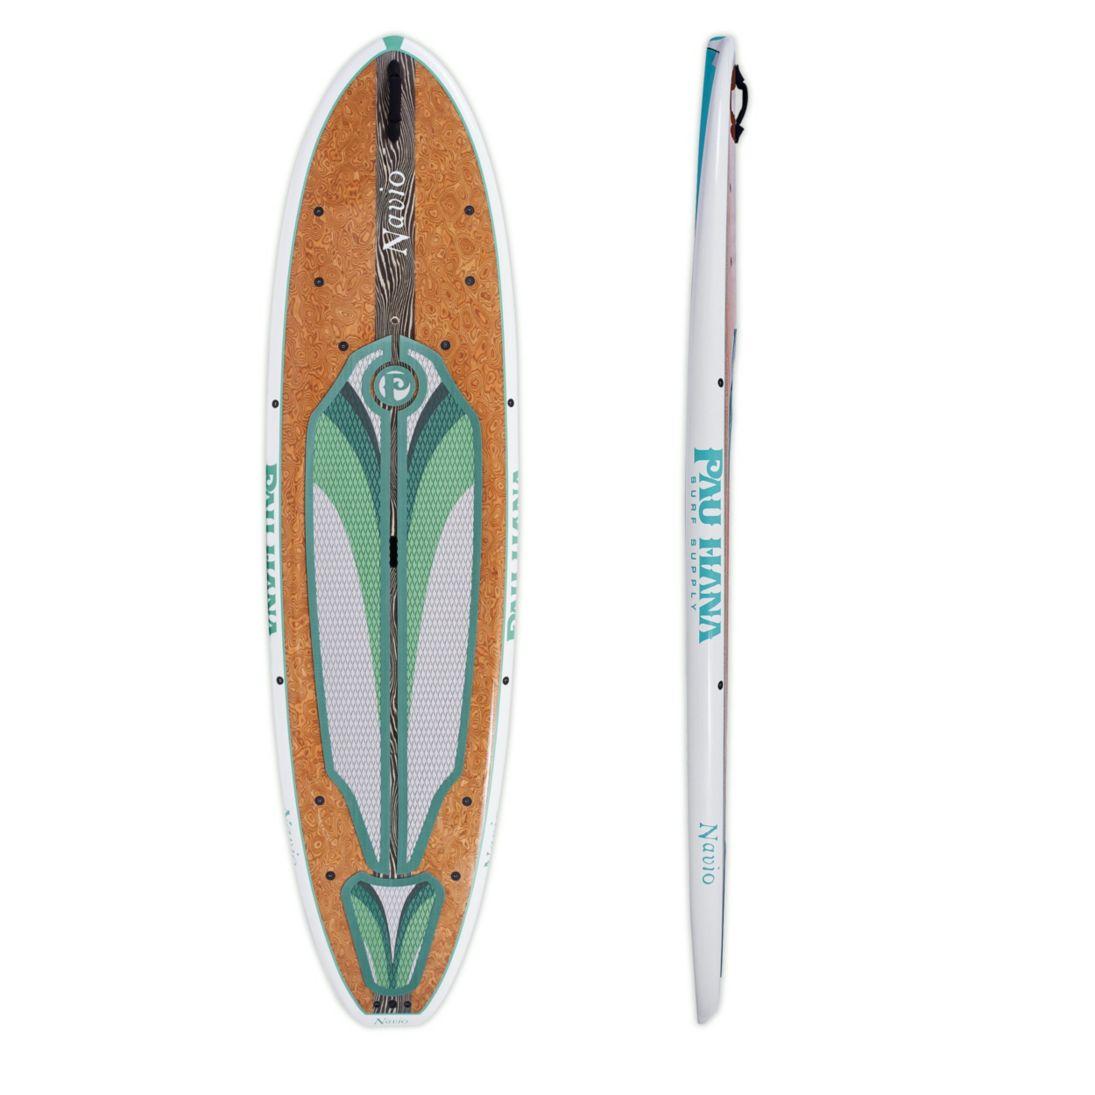 Pau Hana Navio Bamboo Hybrid Keel Hull Stand Up Paddleboard, 11'